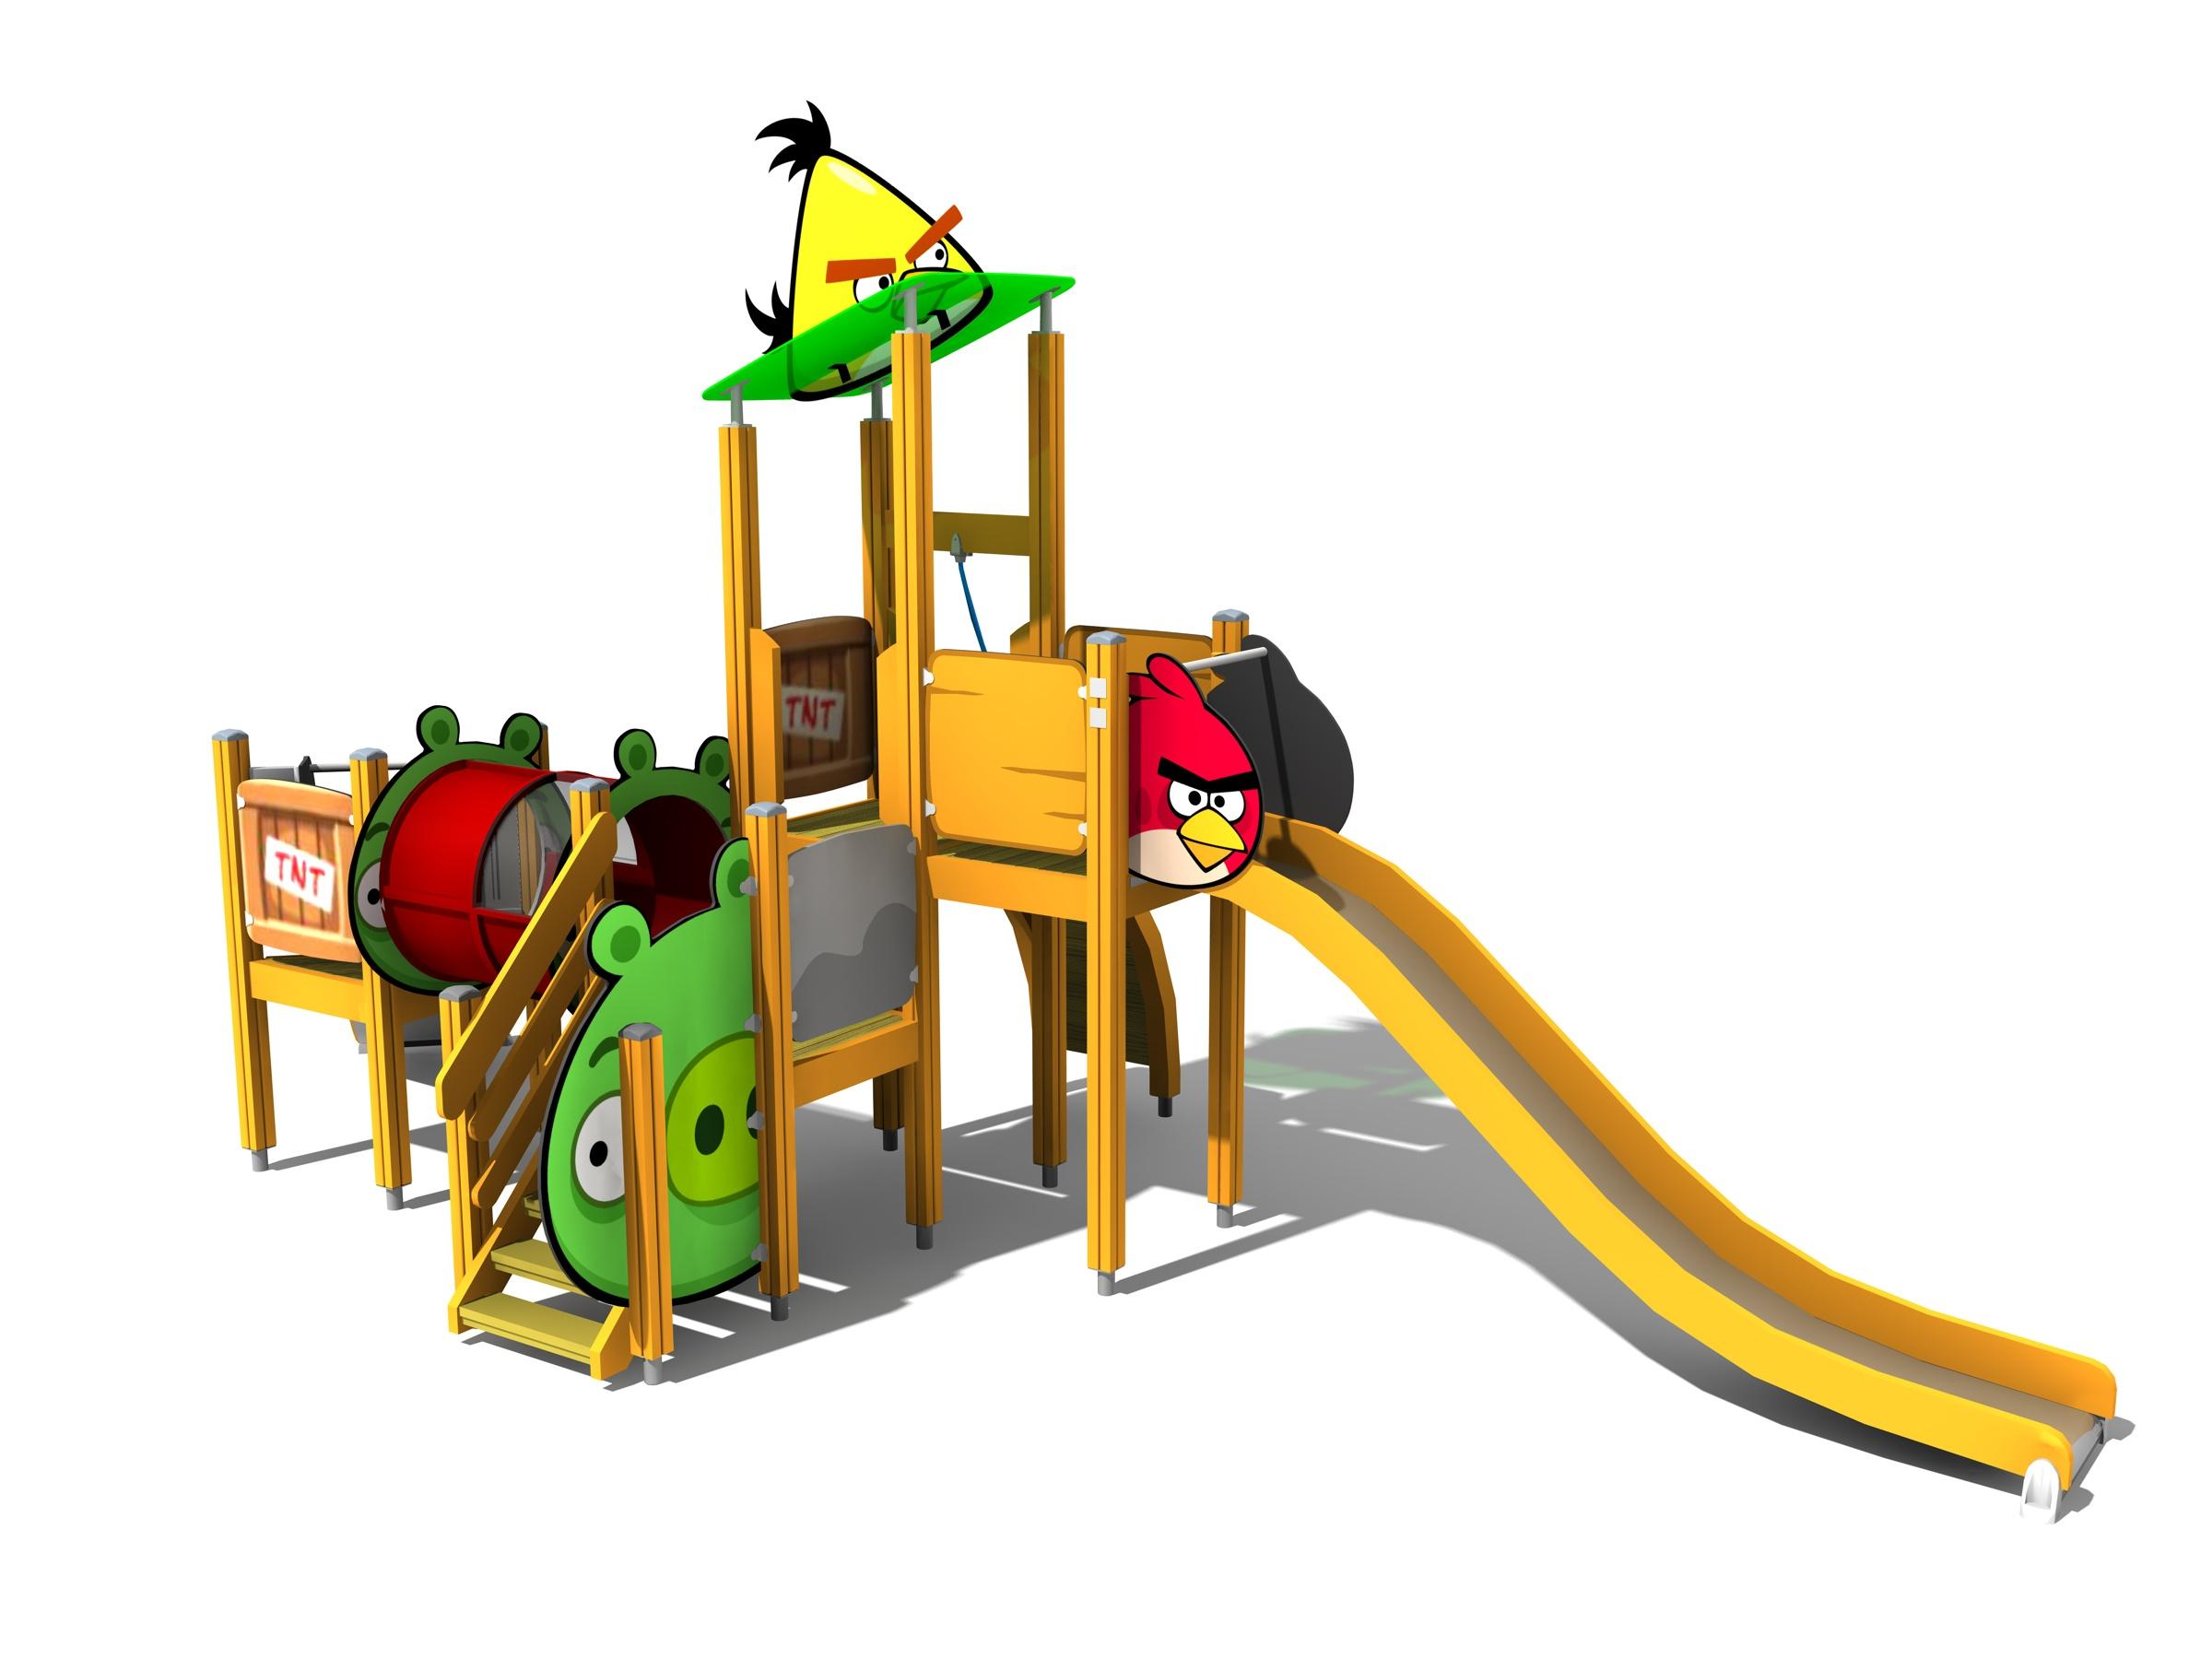 Echipamente de joaca pentru copii LAPPSET - Poza 134